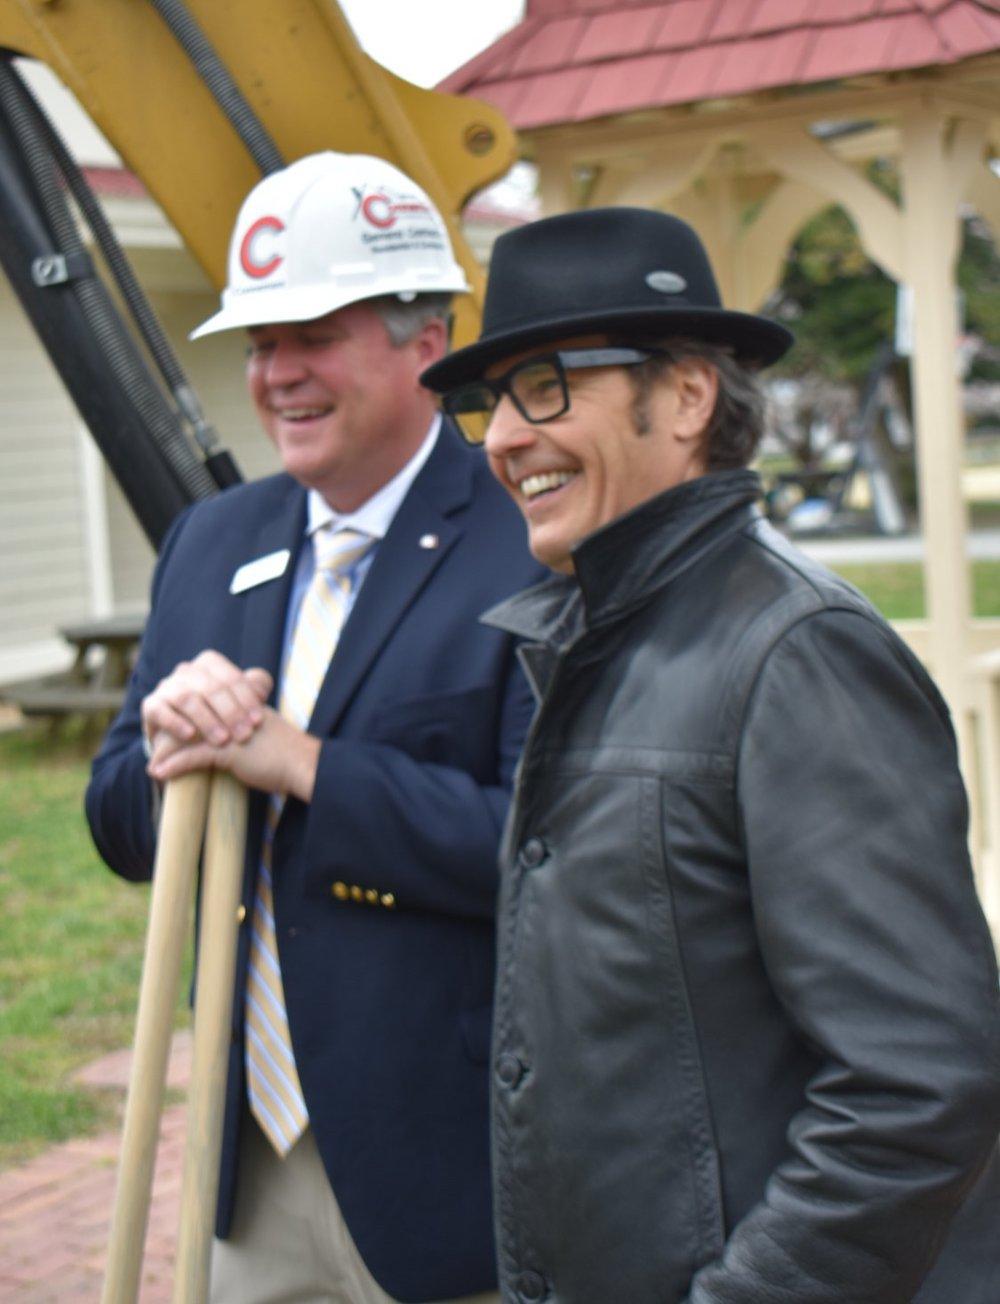 Randall and David Dew, Chesapeake Academy Board Member